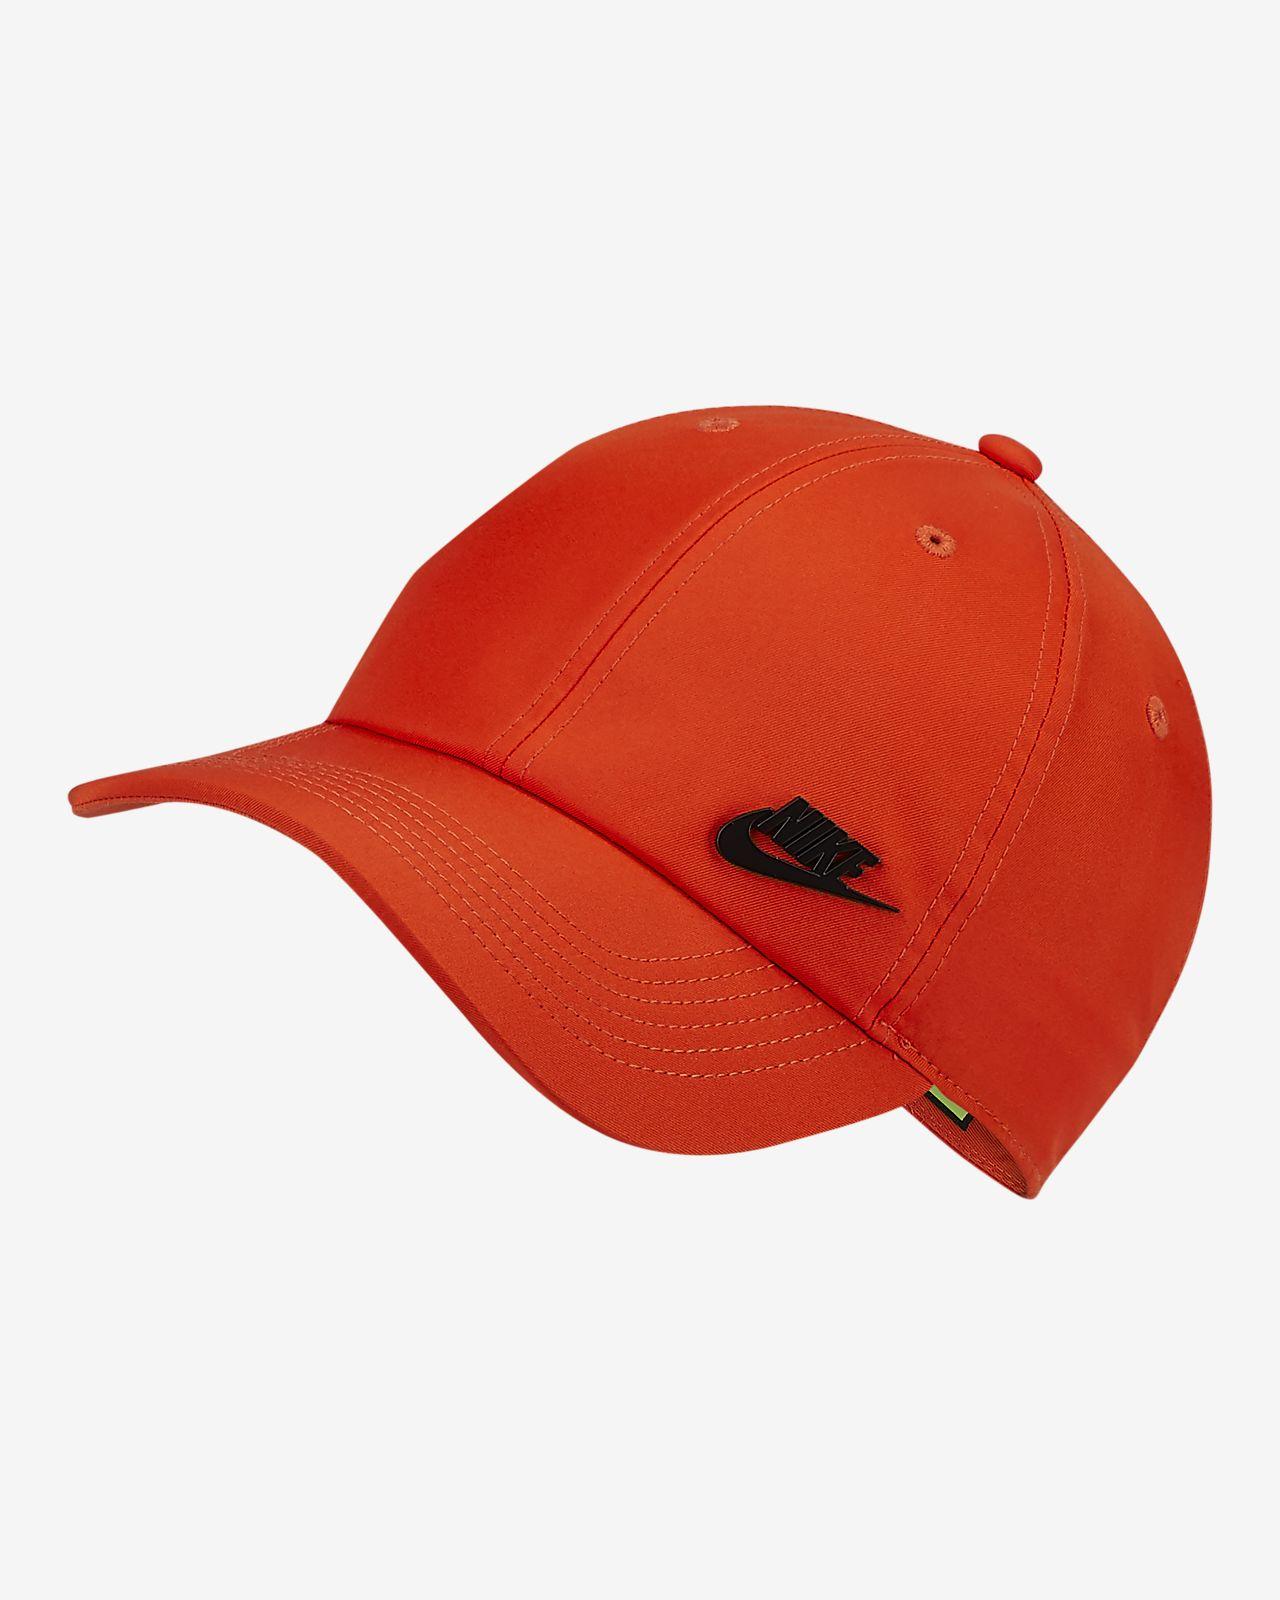 dddfc91e962f0 Nike Sportswear Futura Heritage 86 Adjustable Hat. Nike.com